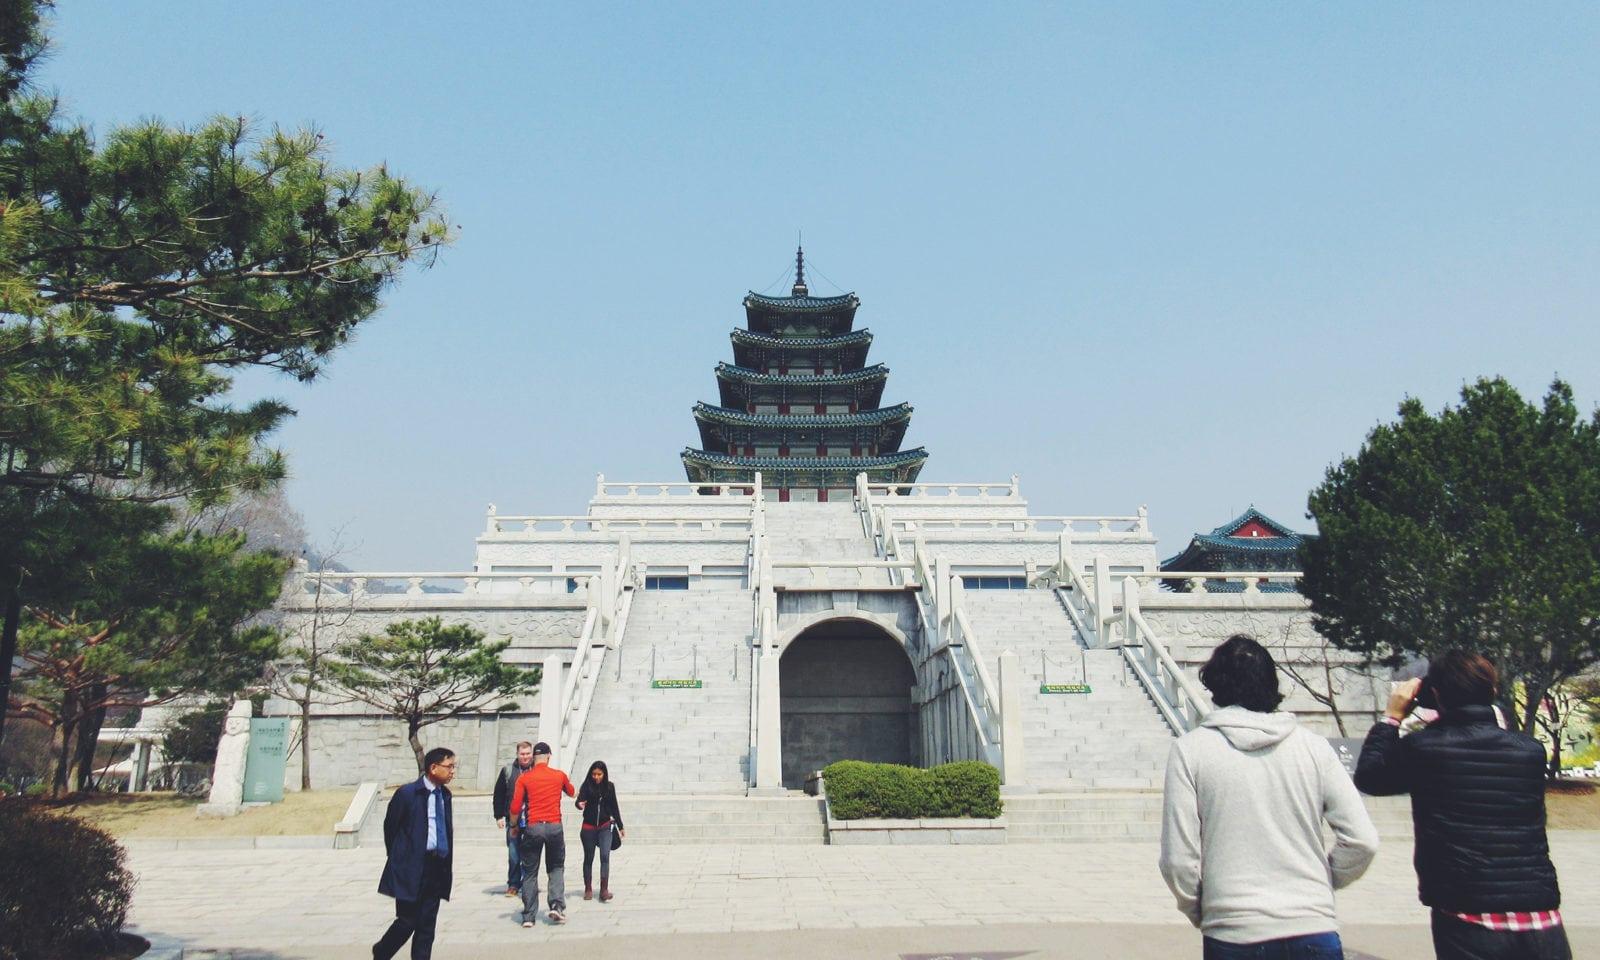 National Folk Museum of Korea | Jongno-gu, Seoul